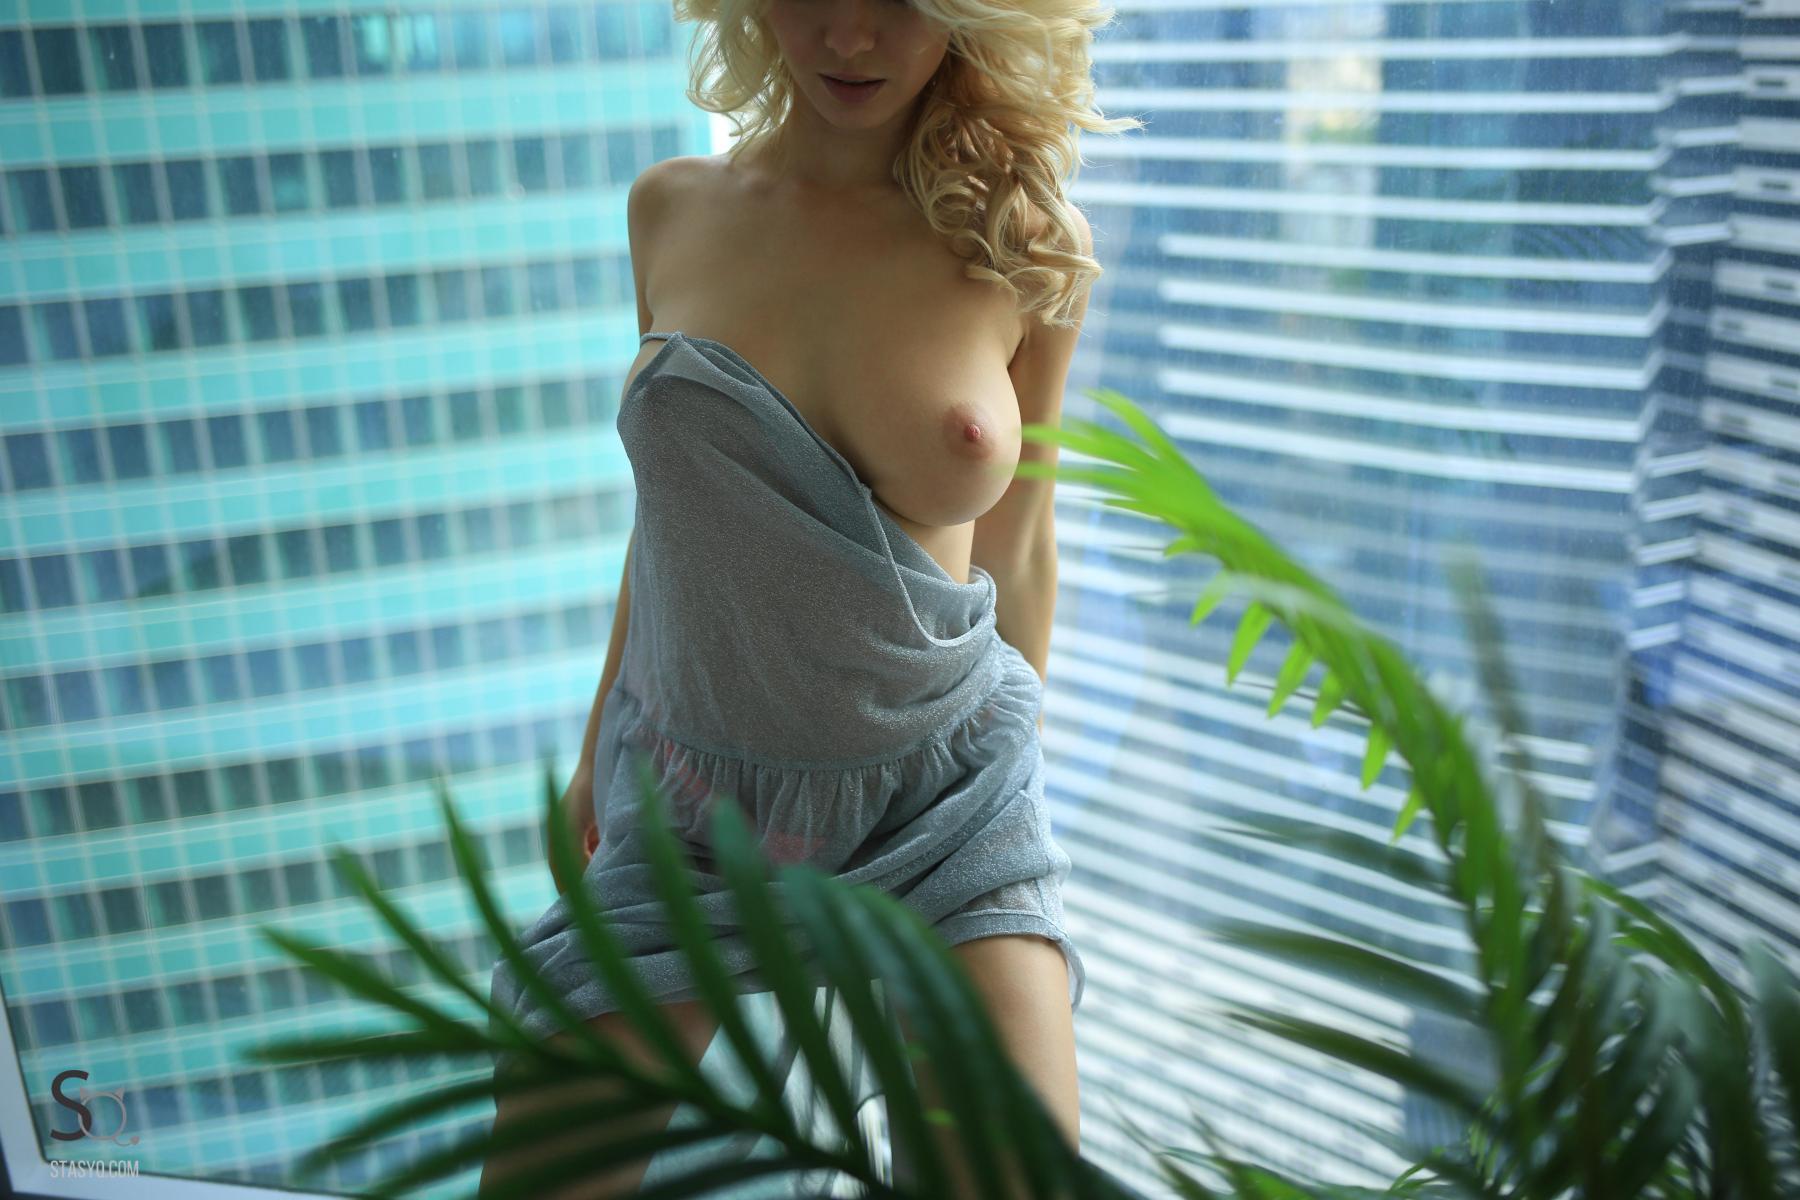 monroq-blonde-boobs-naked-bathroom-window-stasyq-08